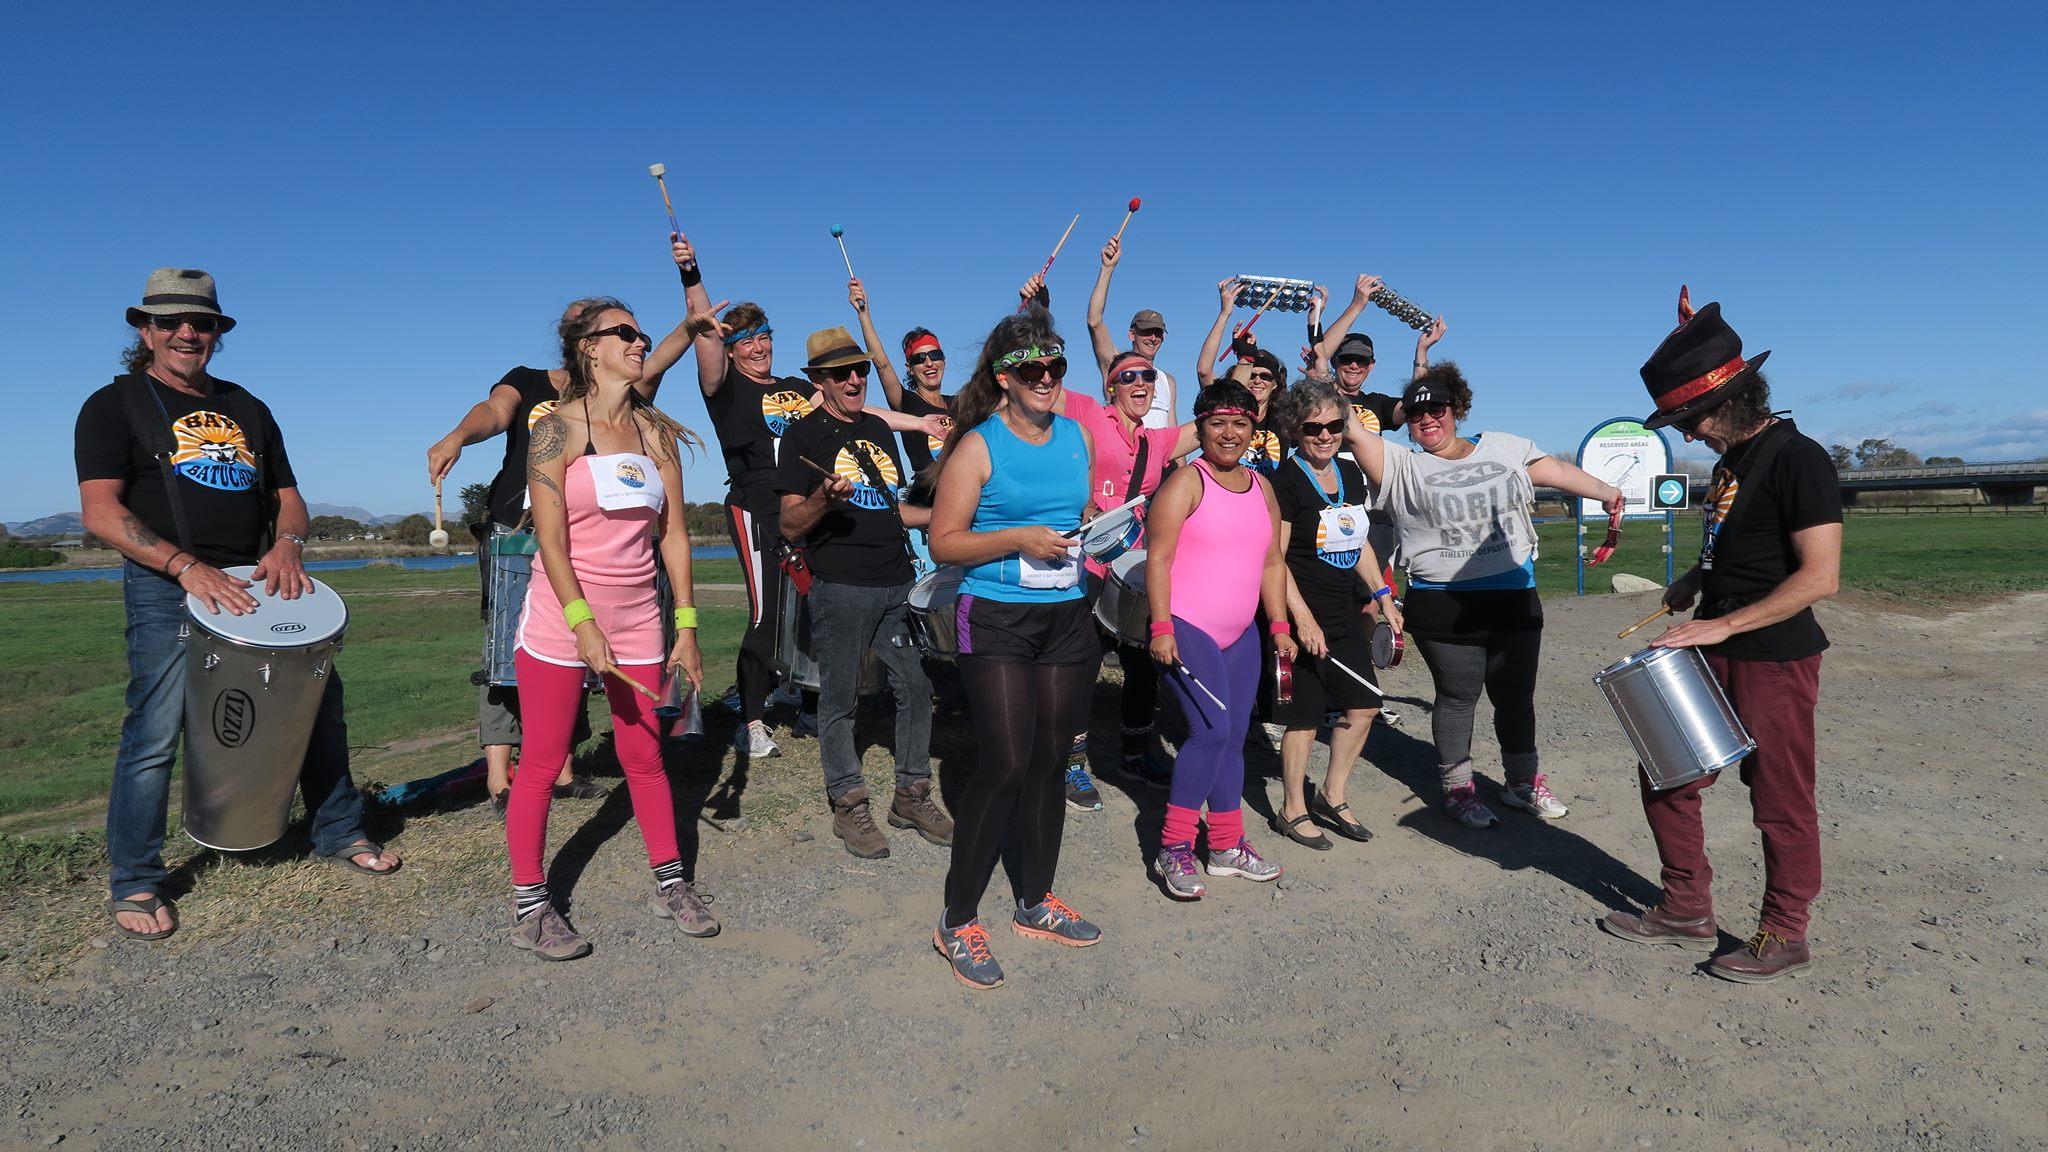 RTW馬拉松評分系列:4. 紐西蘭Hawke's Bay馬拉松 (68.5分) – 馬拉松 看世界/Run the World